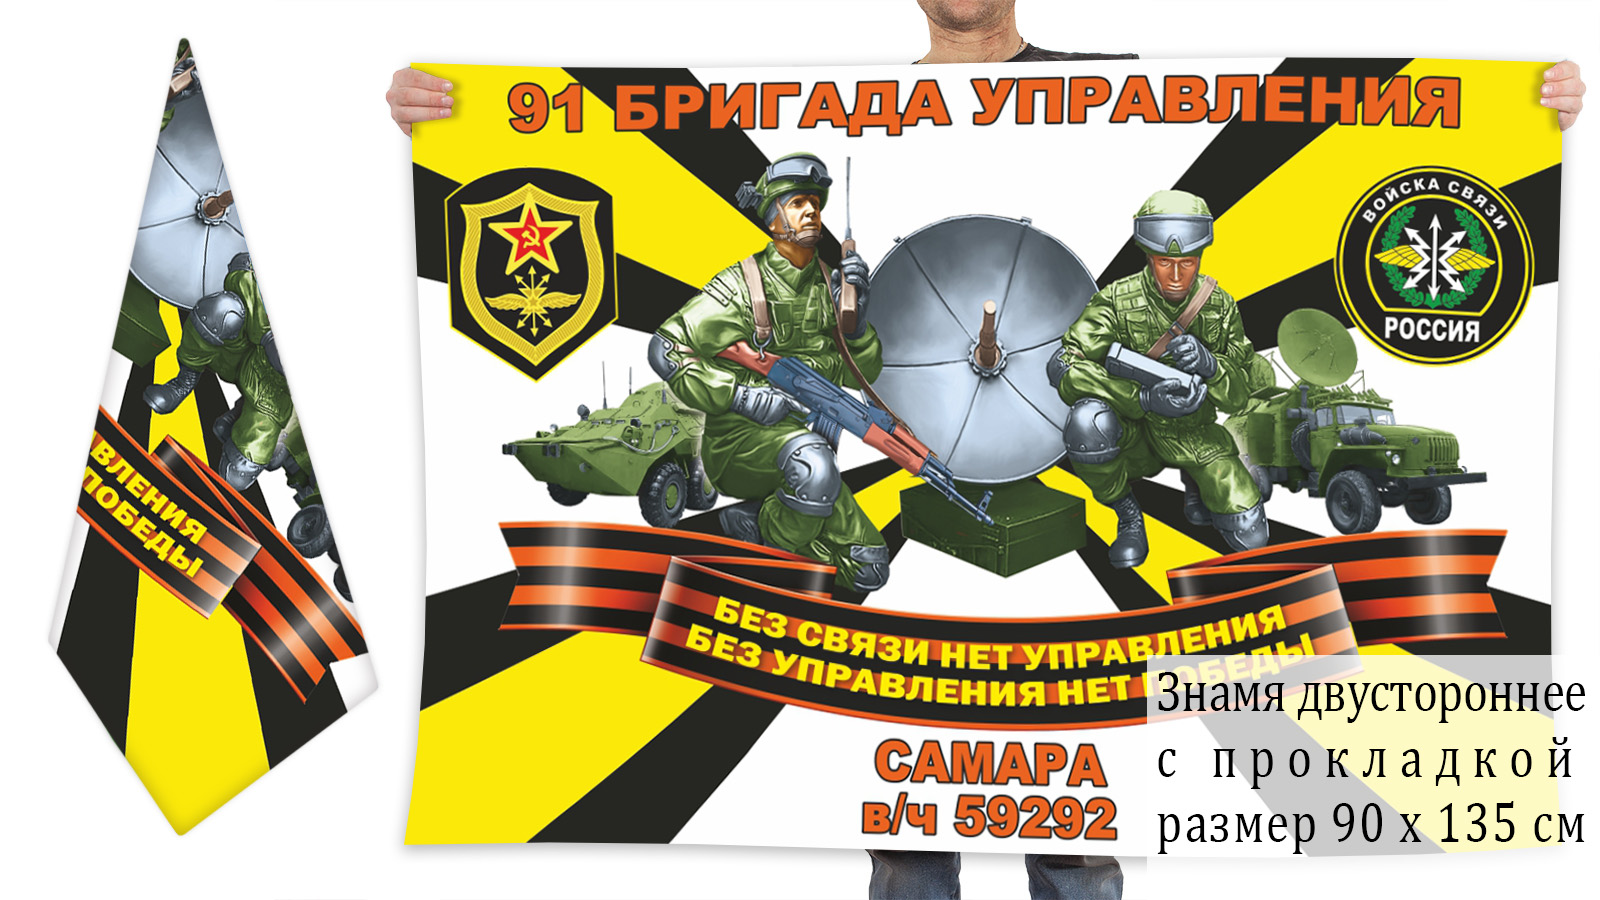 Двусторонний флаг 91 бригада управления войск связи